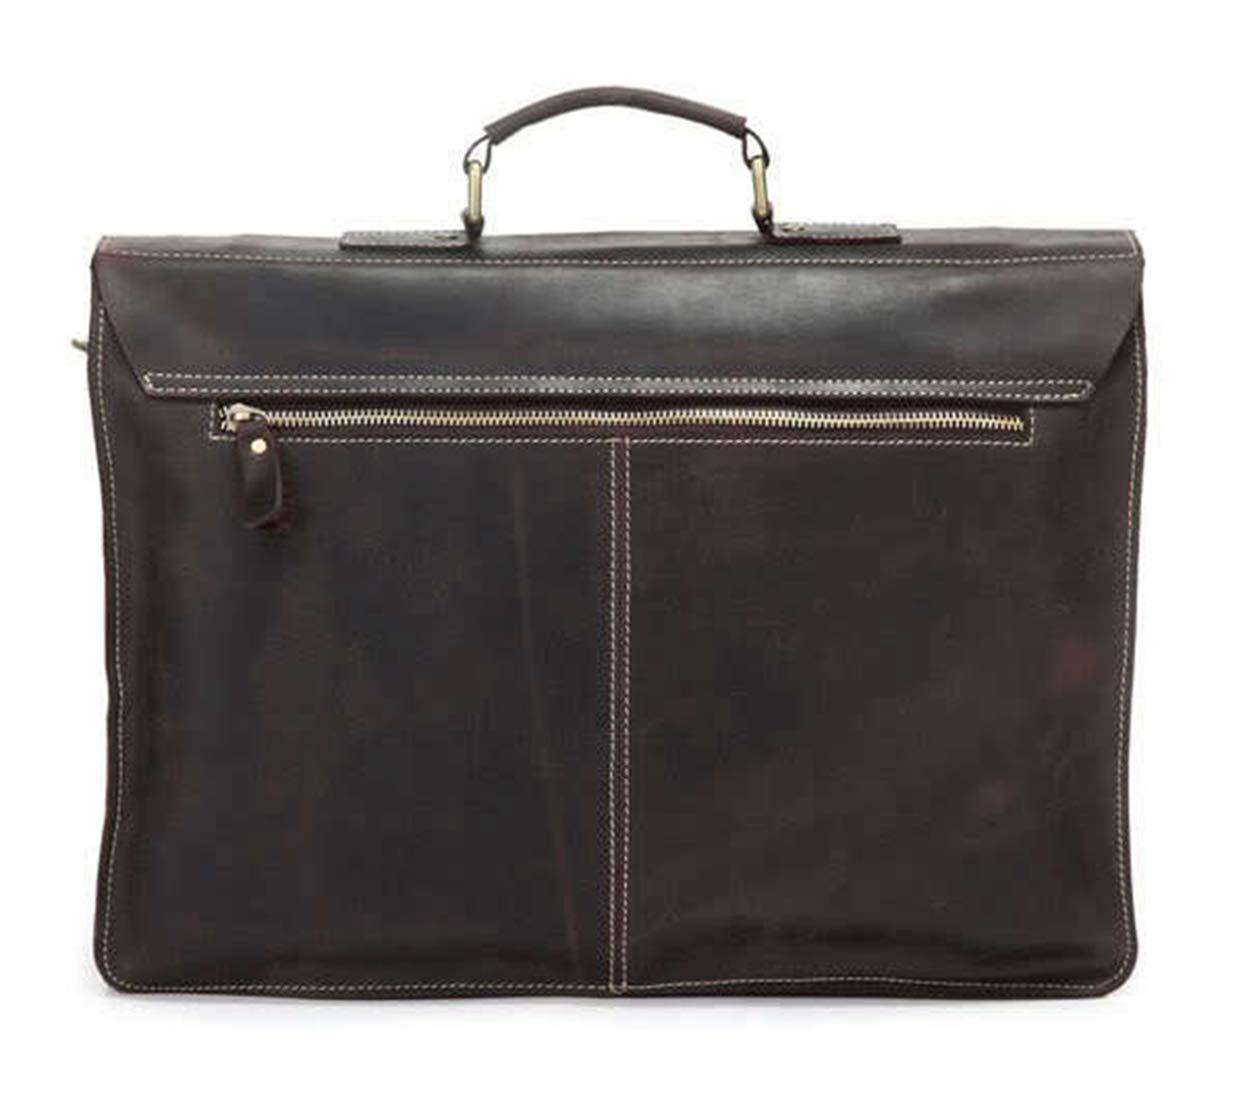 MATCHANT Retro Leather Mens Computer Bag 15 Leather Mens Shoulder Bag Simple Atmosphere Thick Leather Briefcase Color : Dark Brown